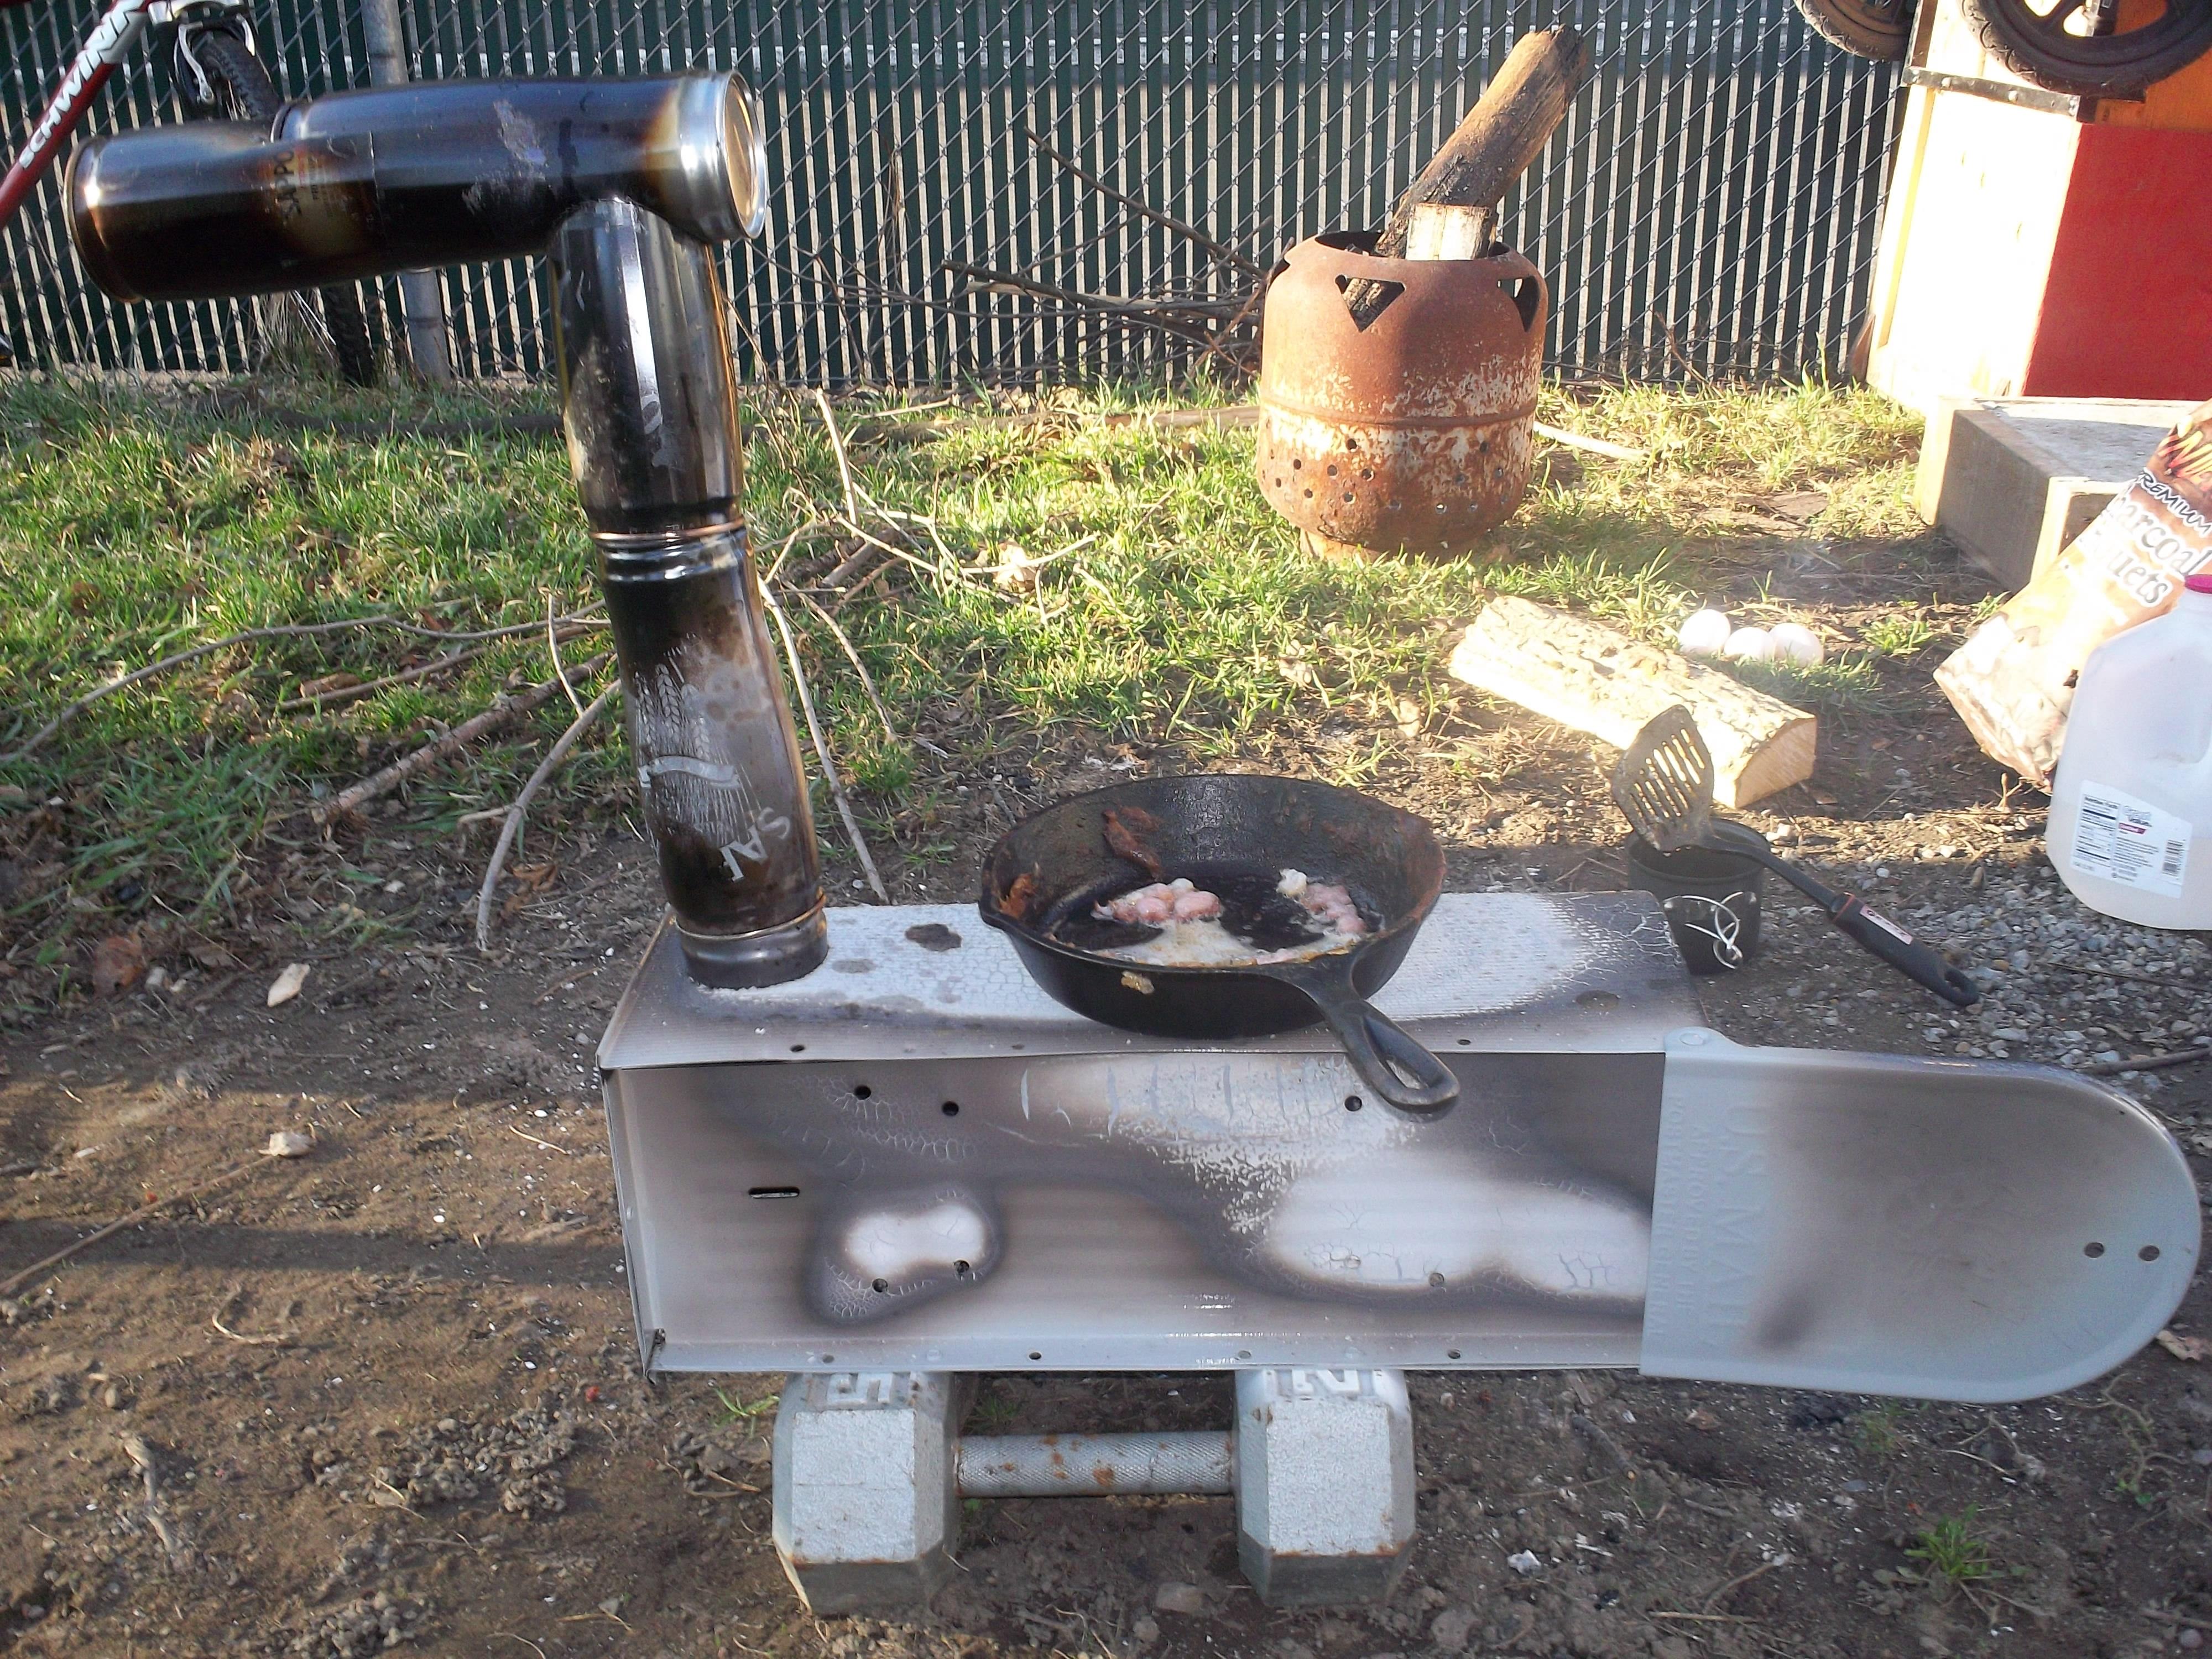 diy wood stove | nagginginspiration